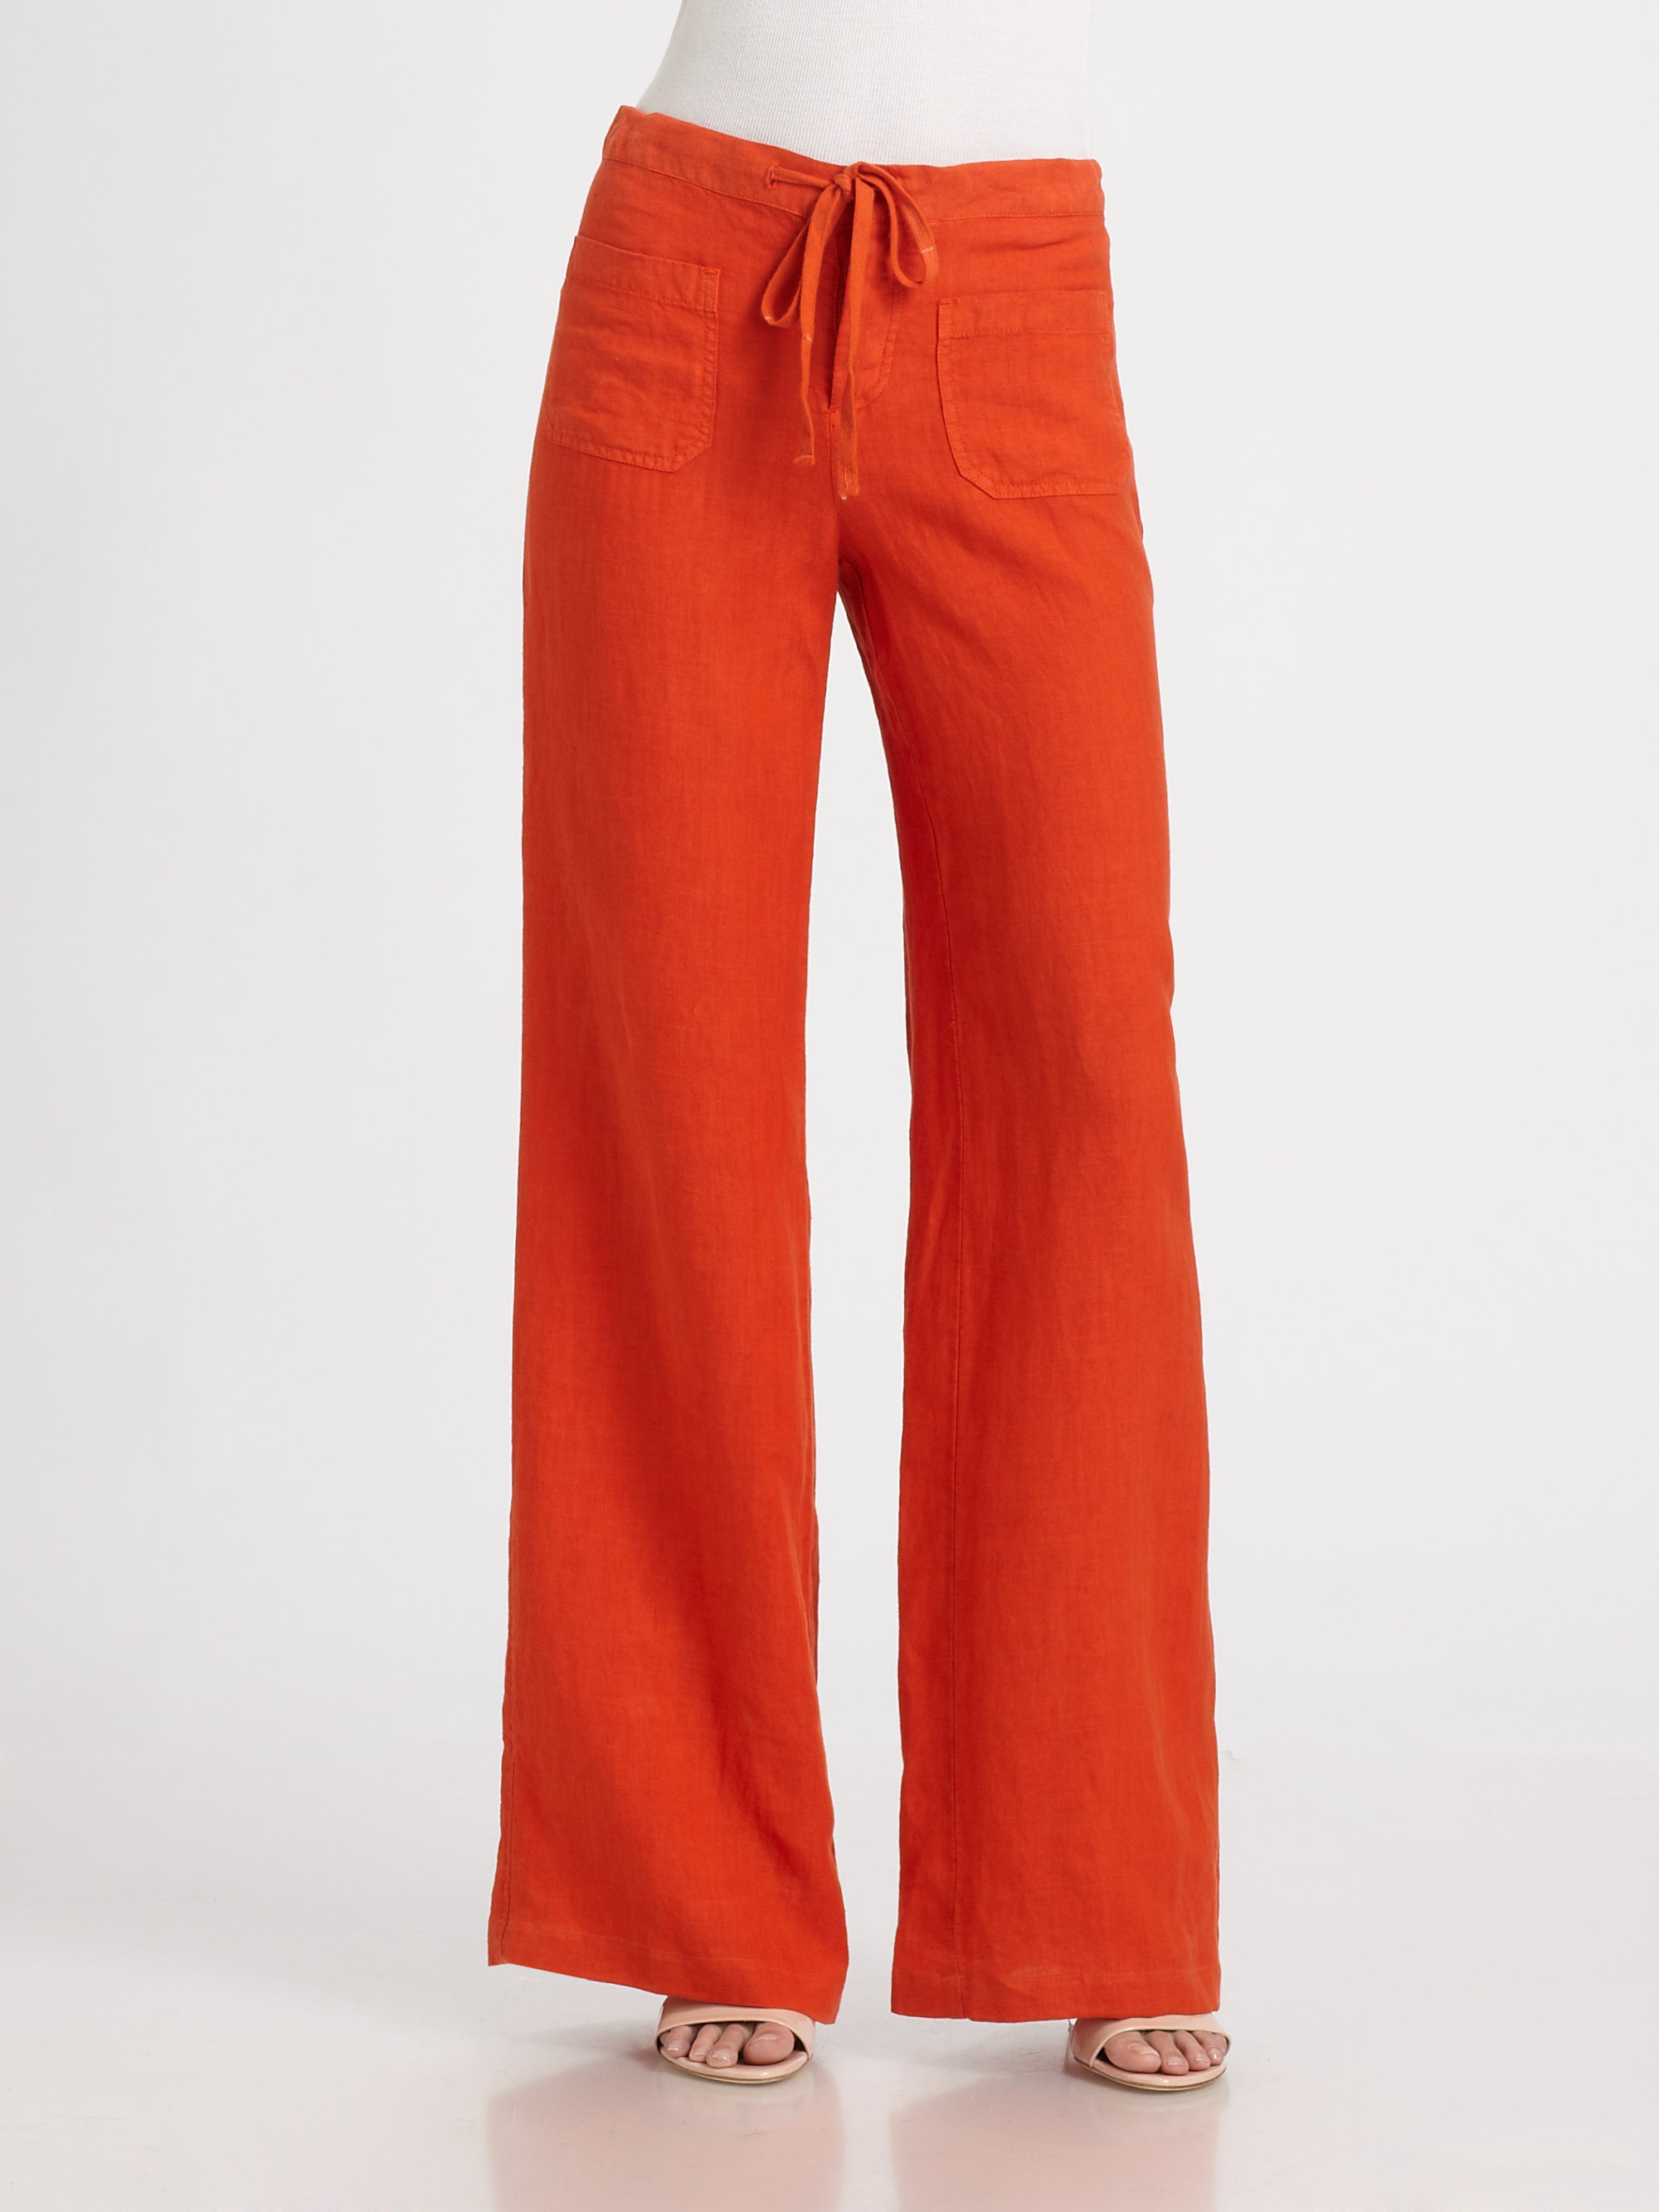 Vince Linen Beach Pants in Orange | Lyst